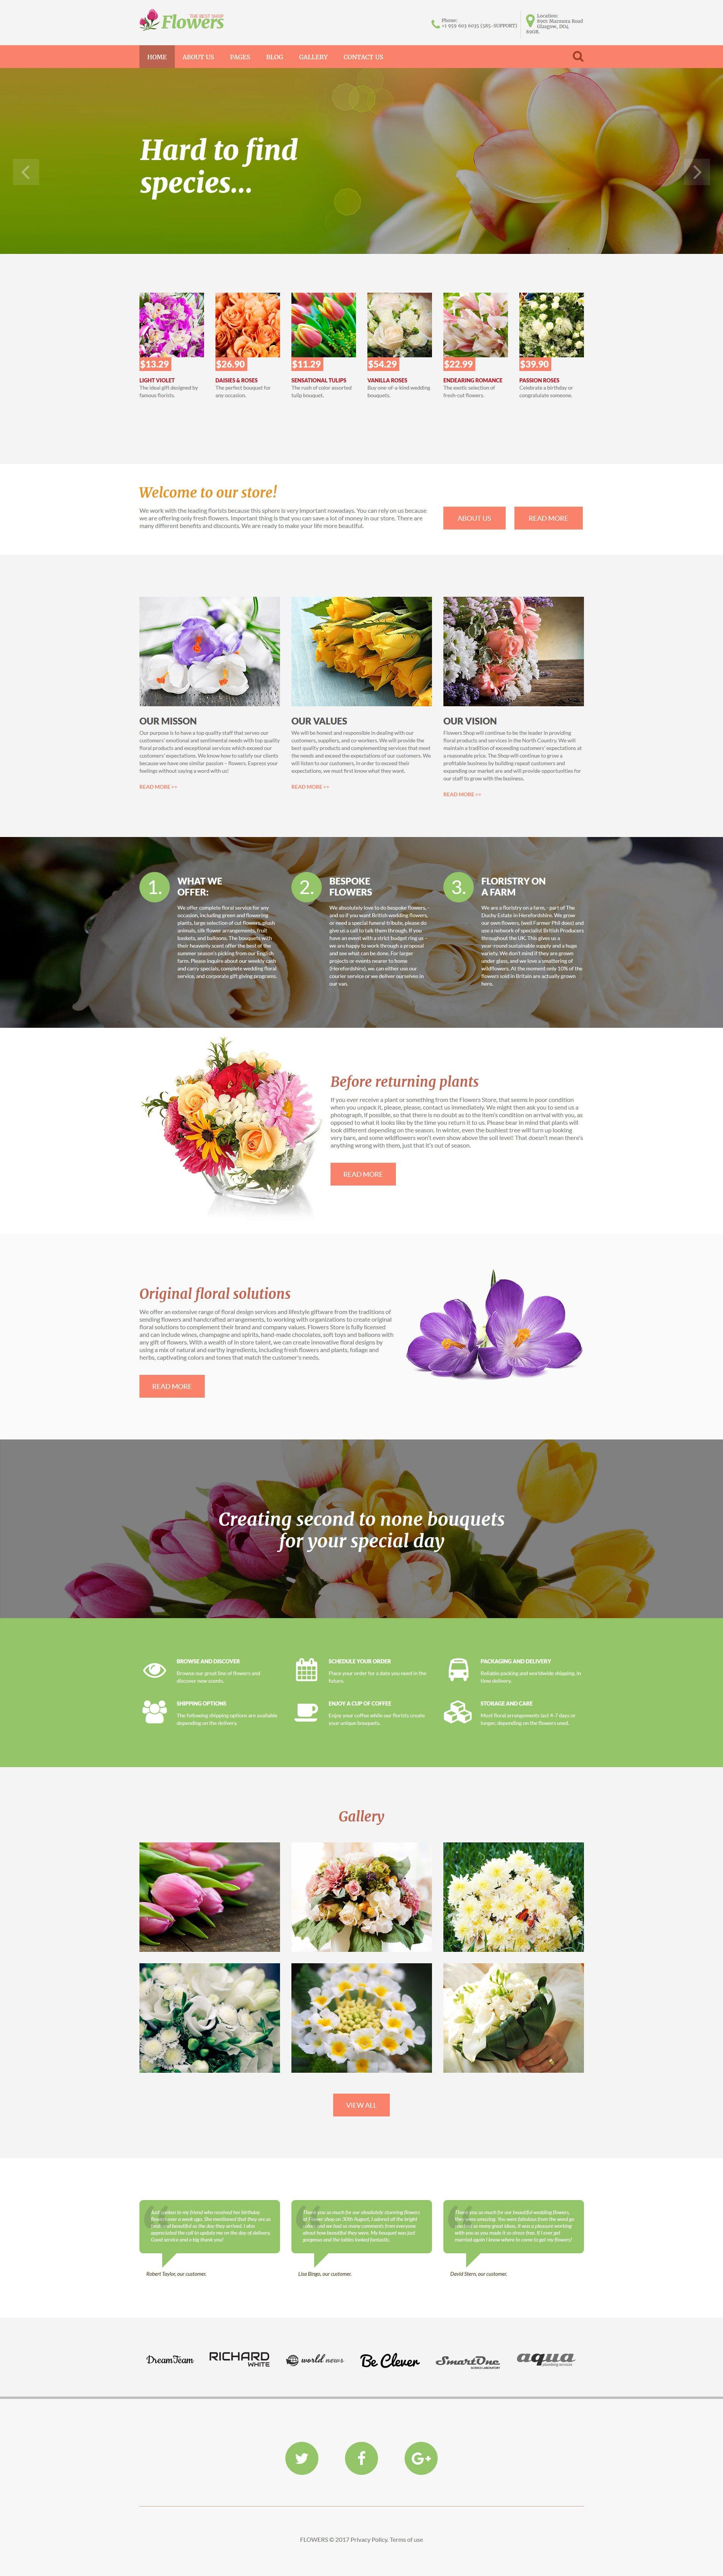 Flowers - Flower Shop Responsive №62256 - скриншот